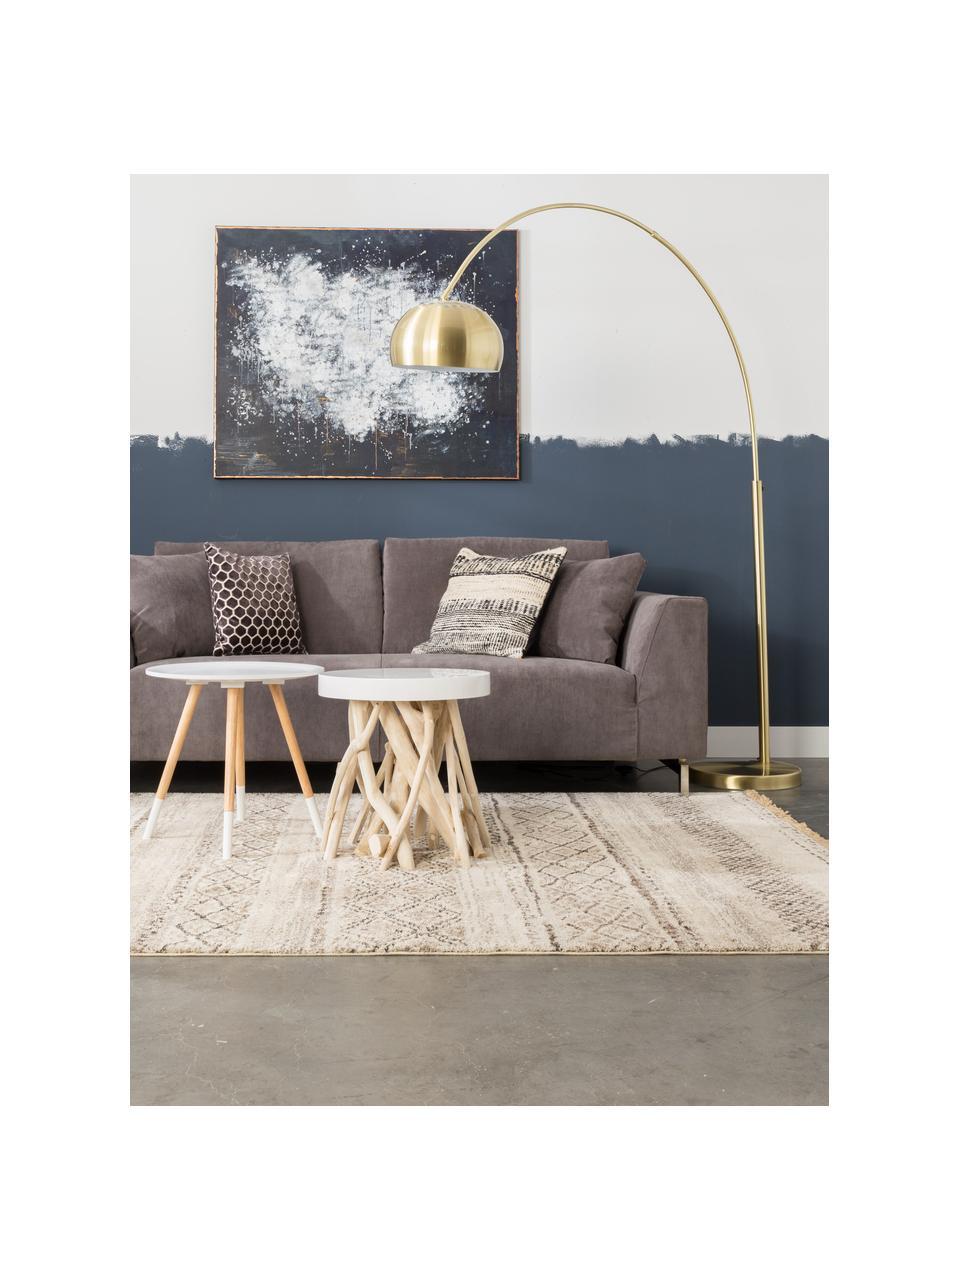 Grote booglamp Metal Bow in goudkleur, Lampenkap: vermessingd metaal, Frame: vermessingd metaal, Lampvoet: steen met vermessingd met, Messingkleurig, 170 x 205 cm